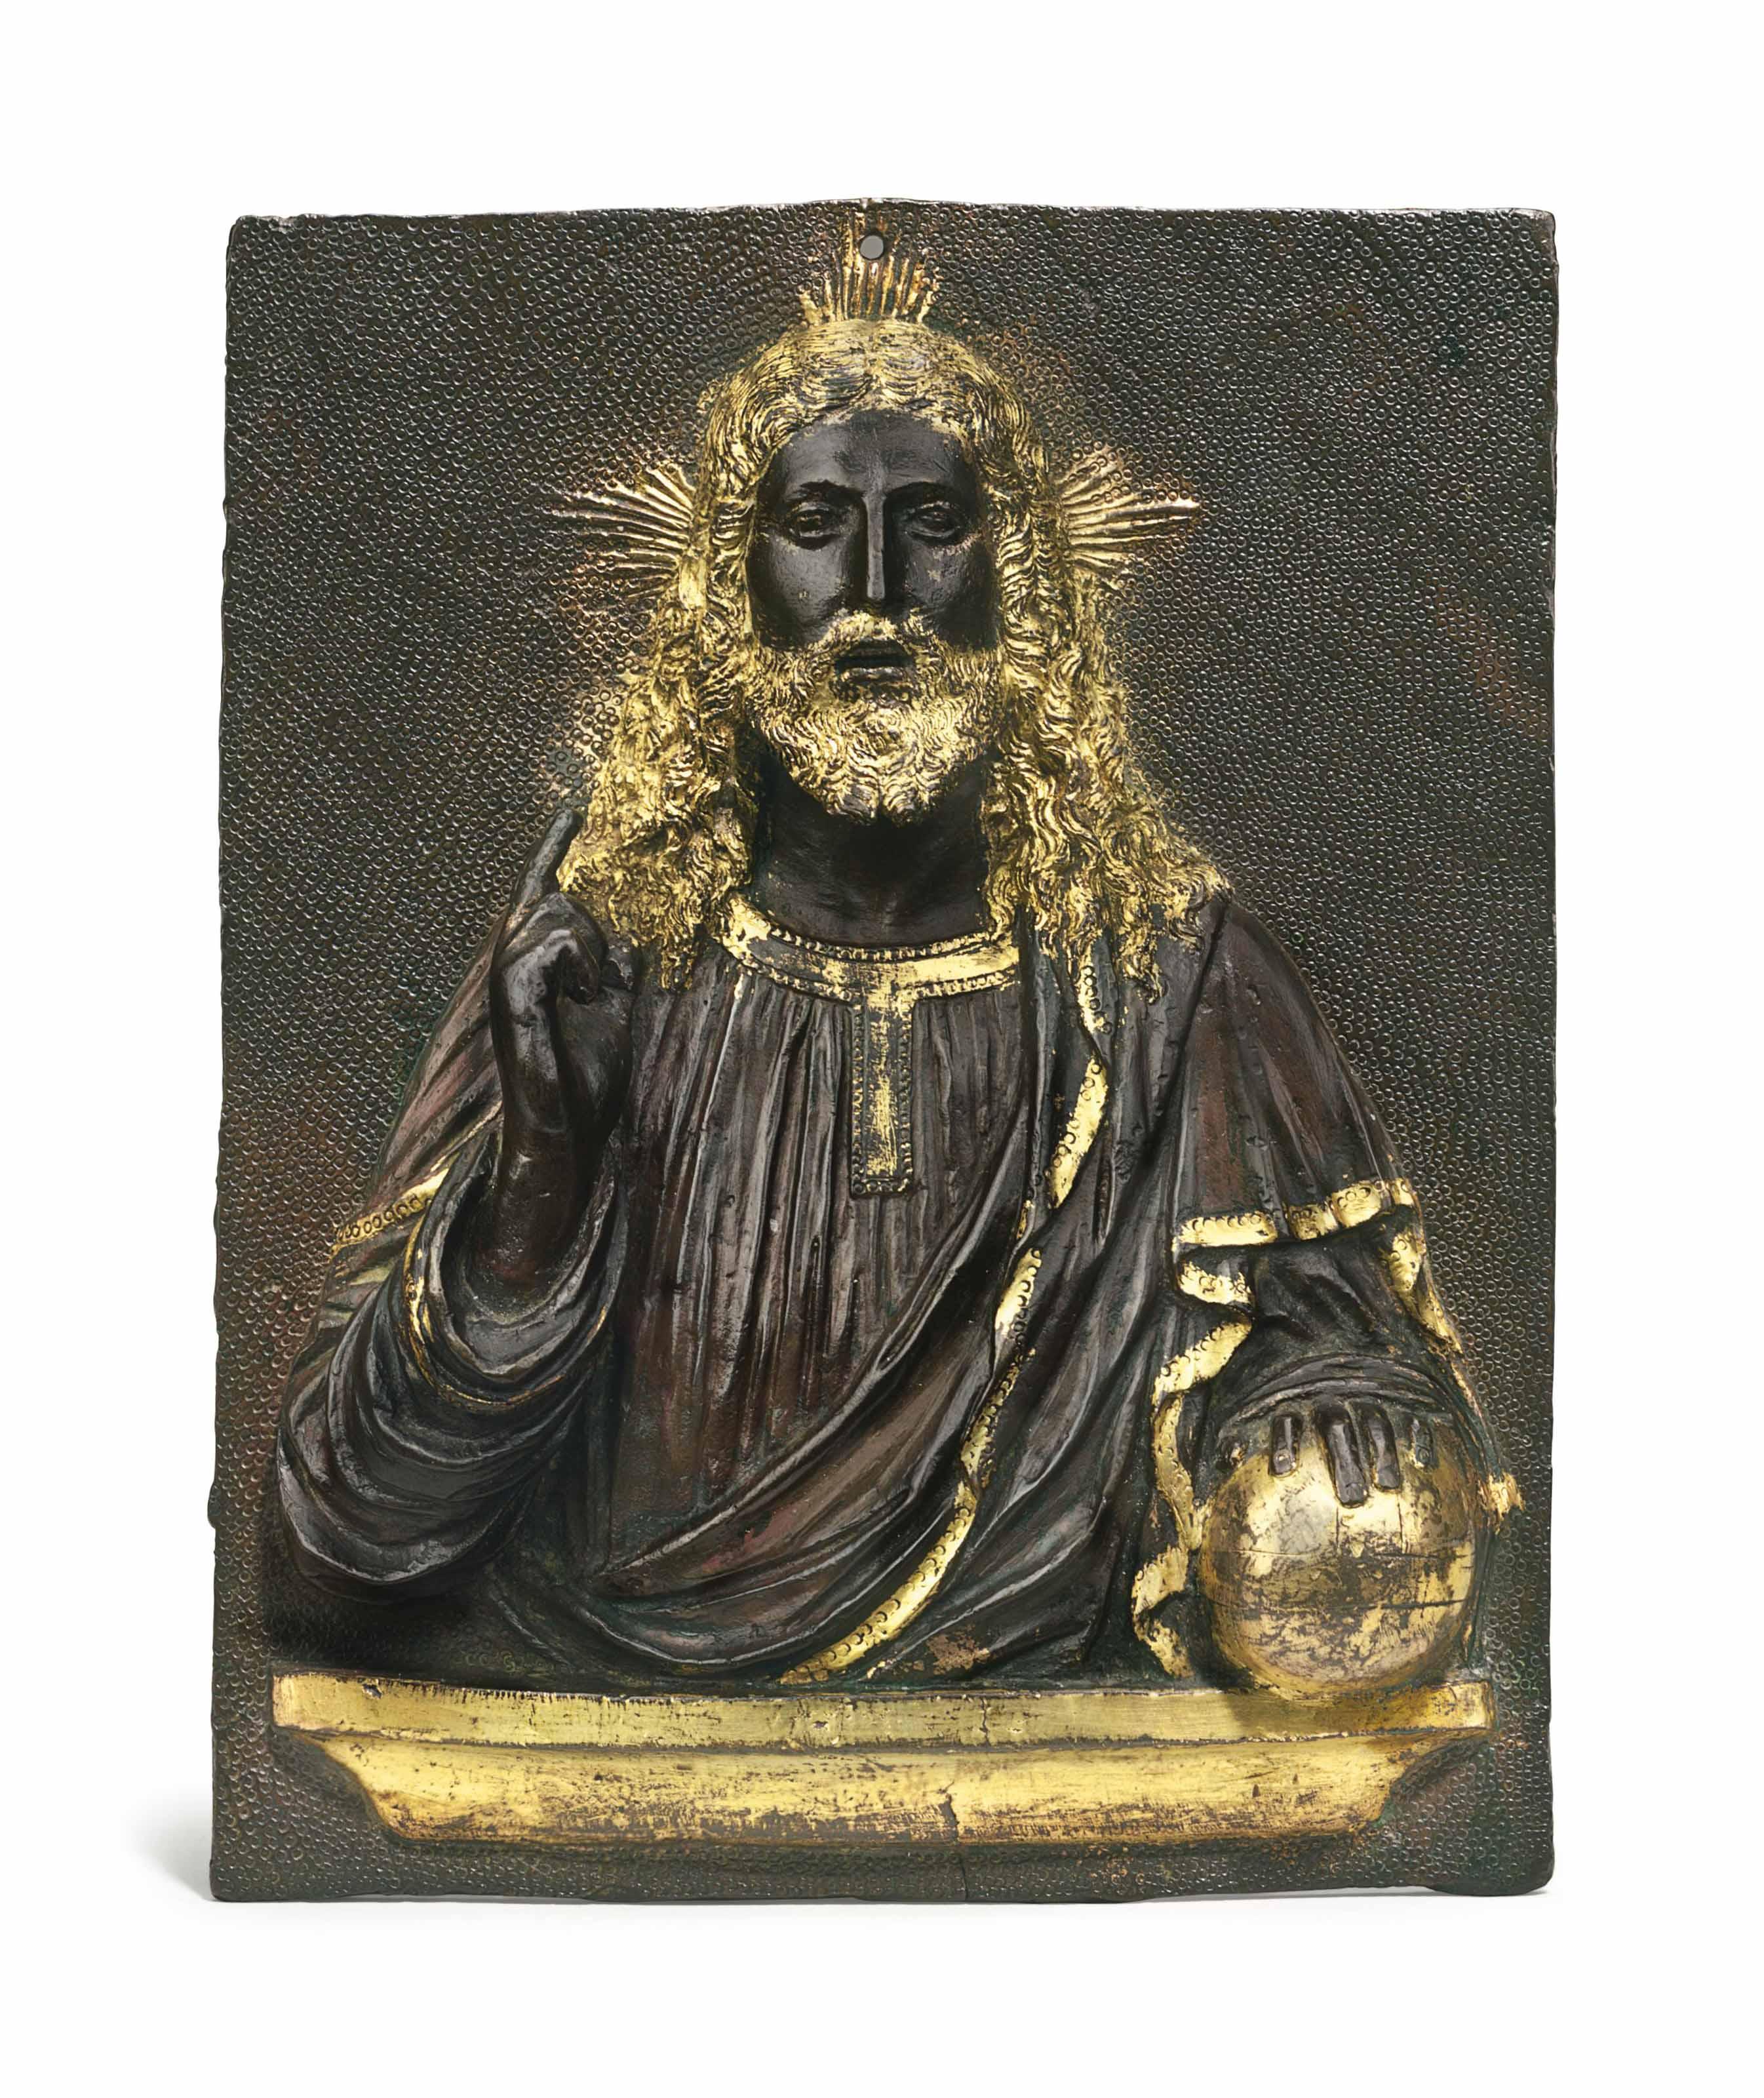 A PARCEL-GILT RECTANGULAR BRONZE RELIEF OF CHRIST AS SALVATOR MUNDI